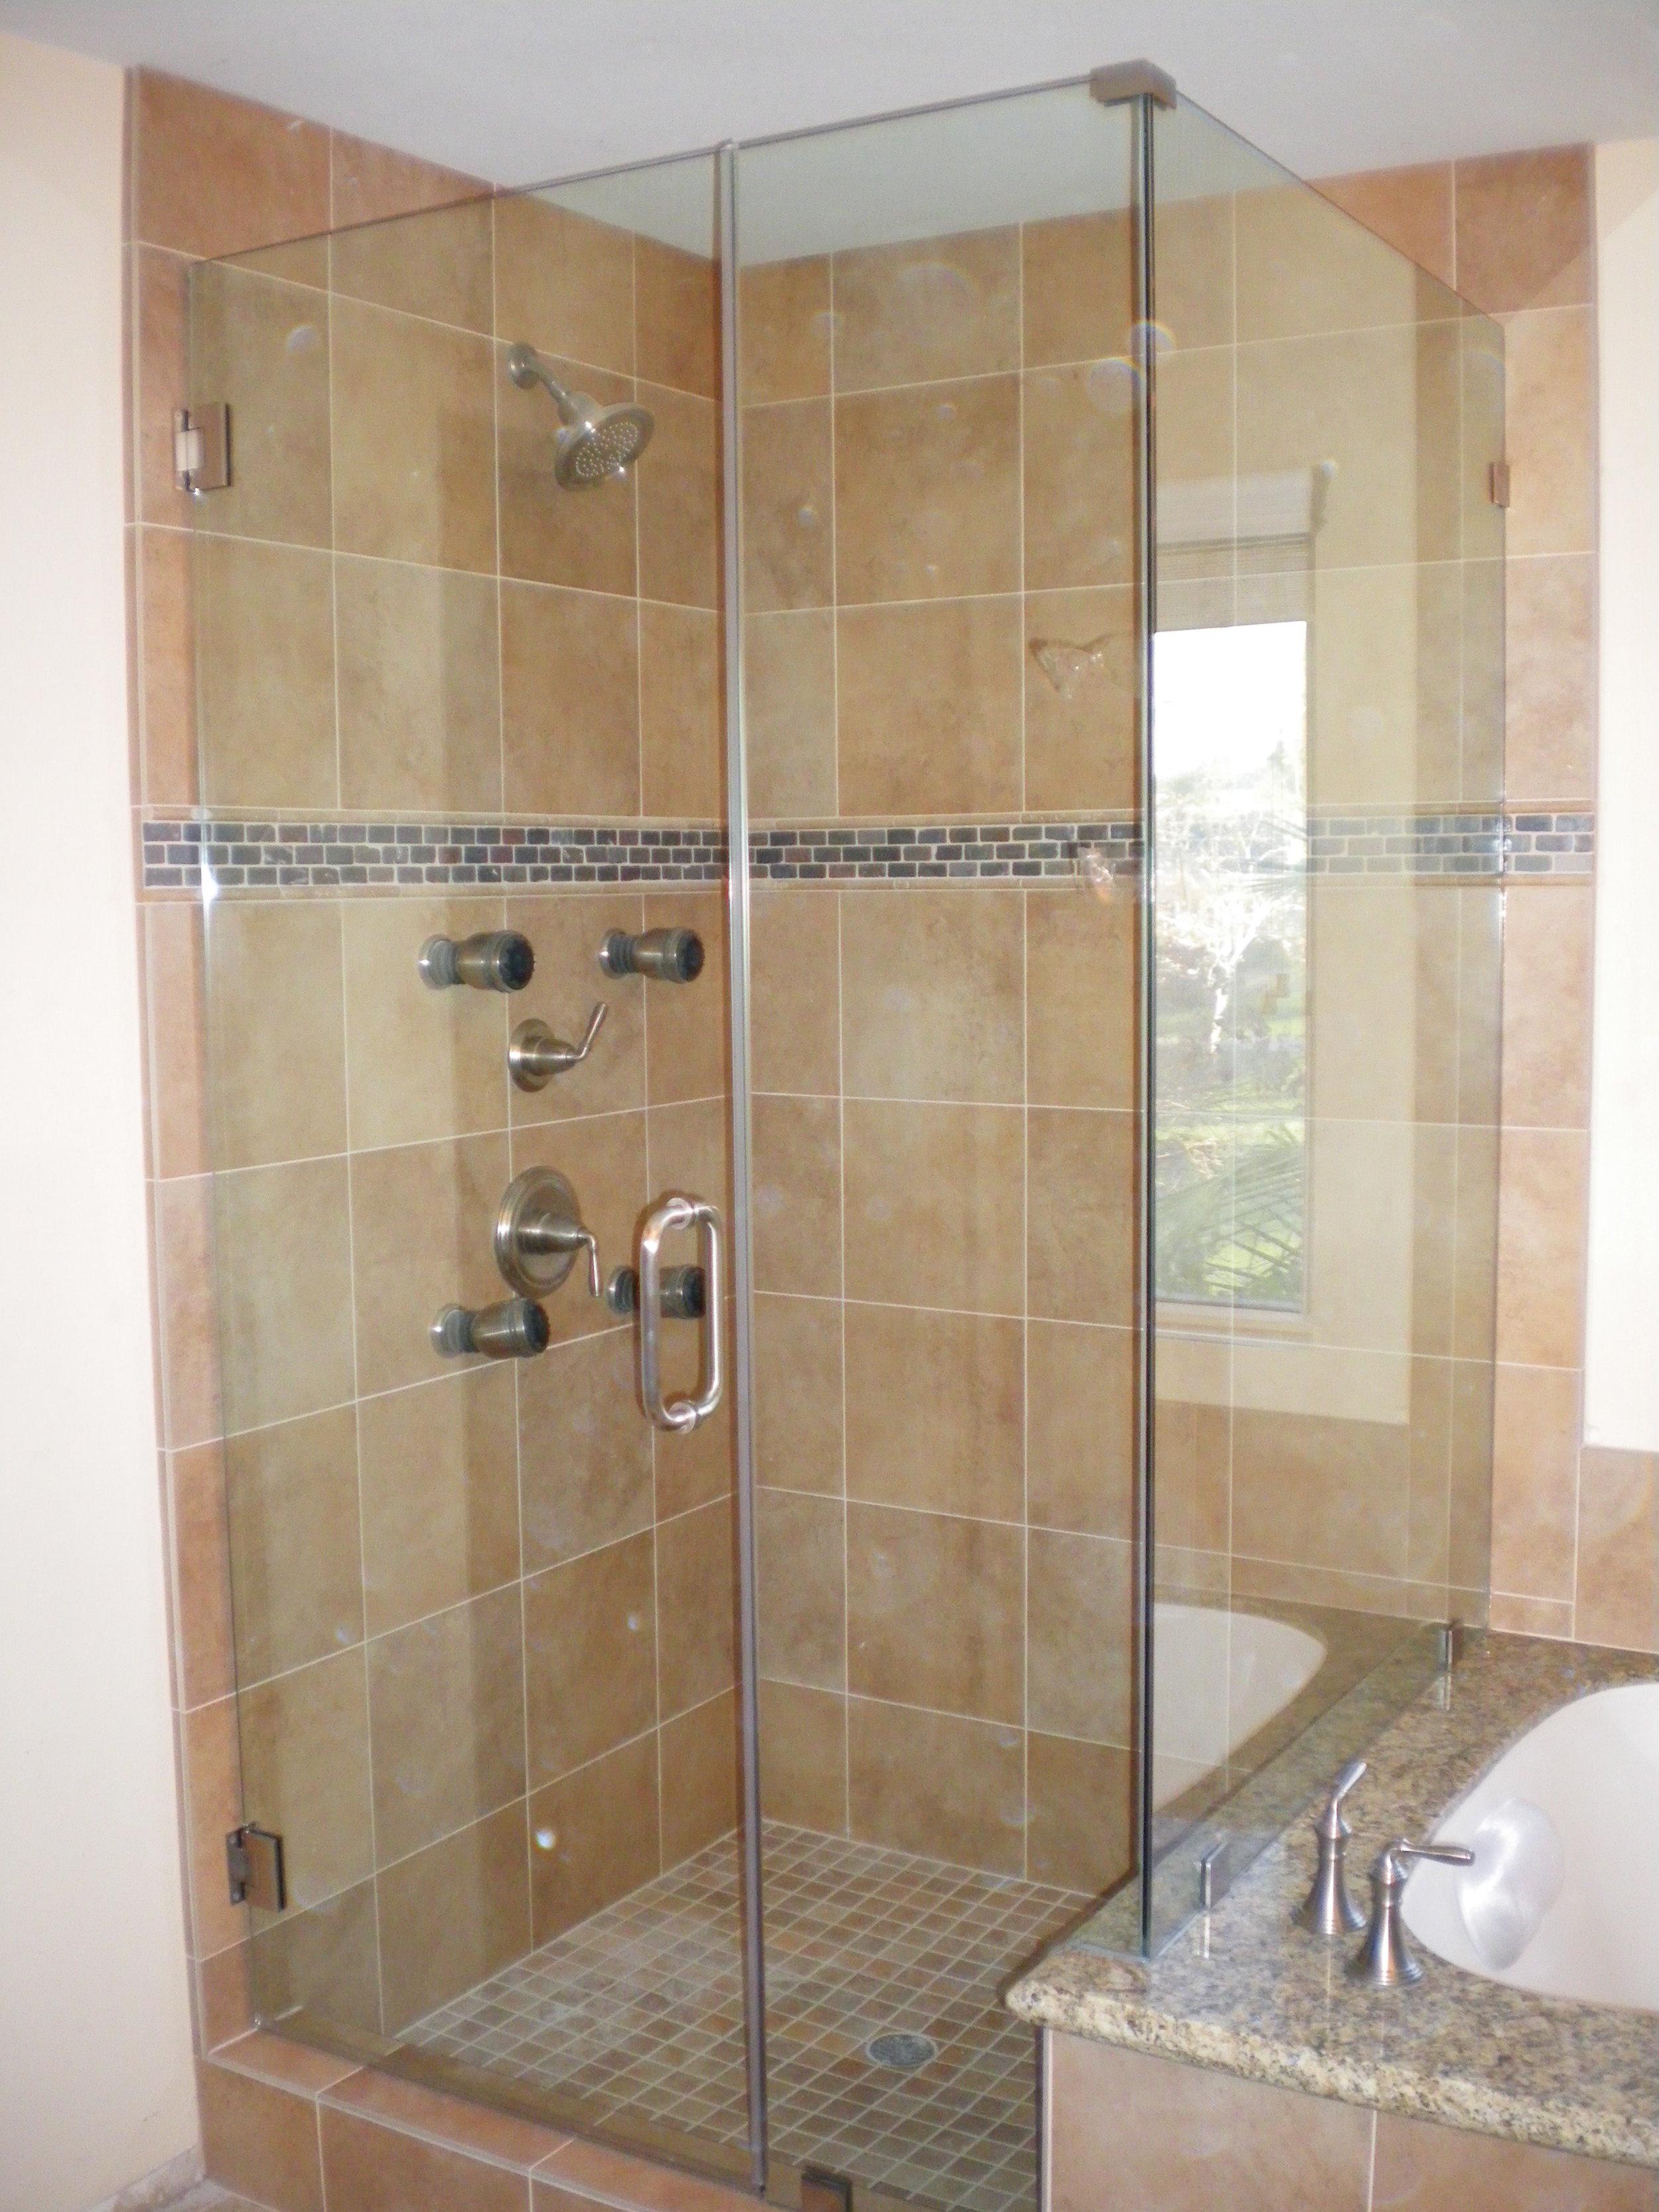 Shower-Doors-Residential-Photos-29.jpg